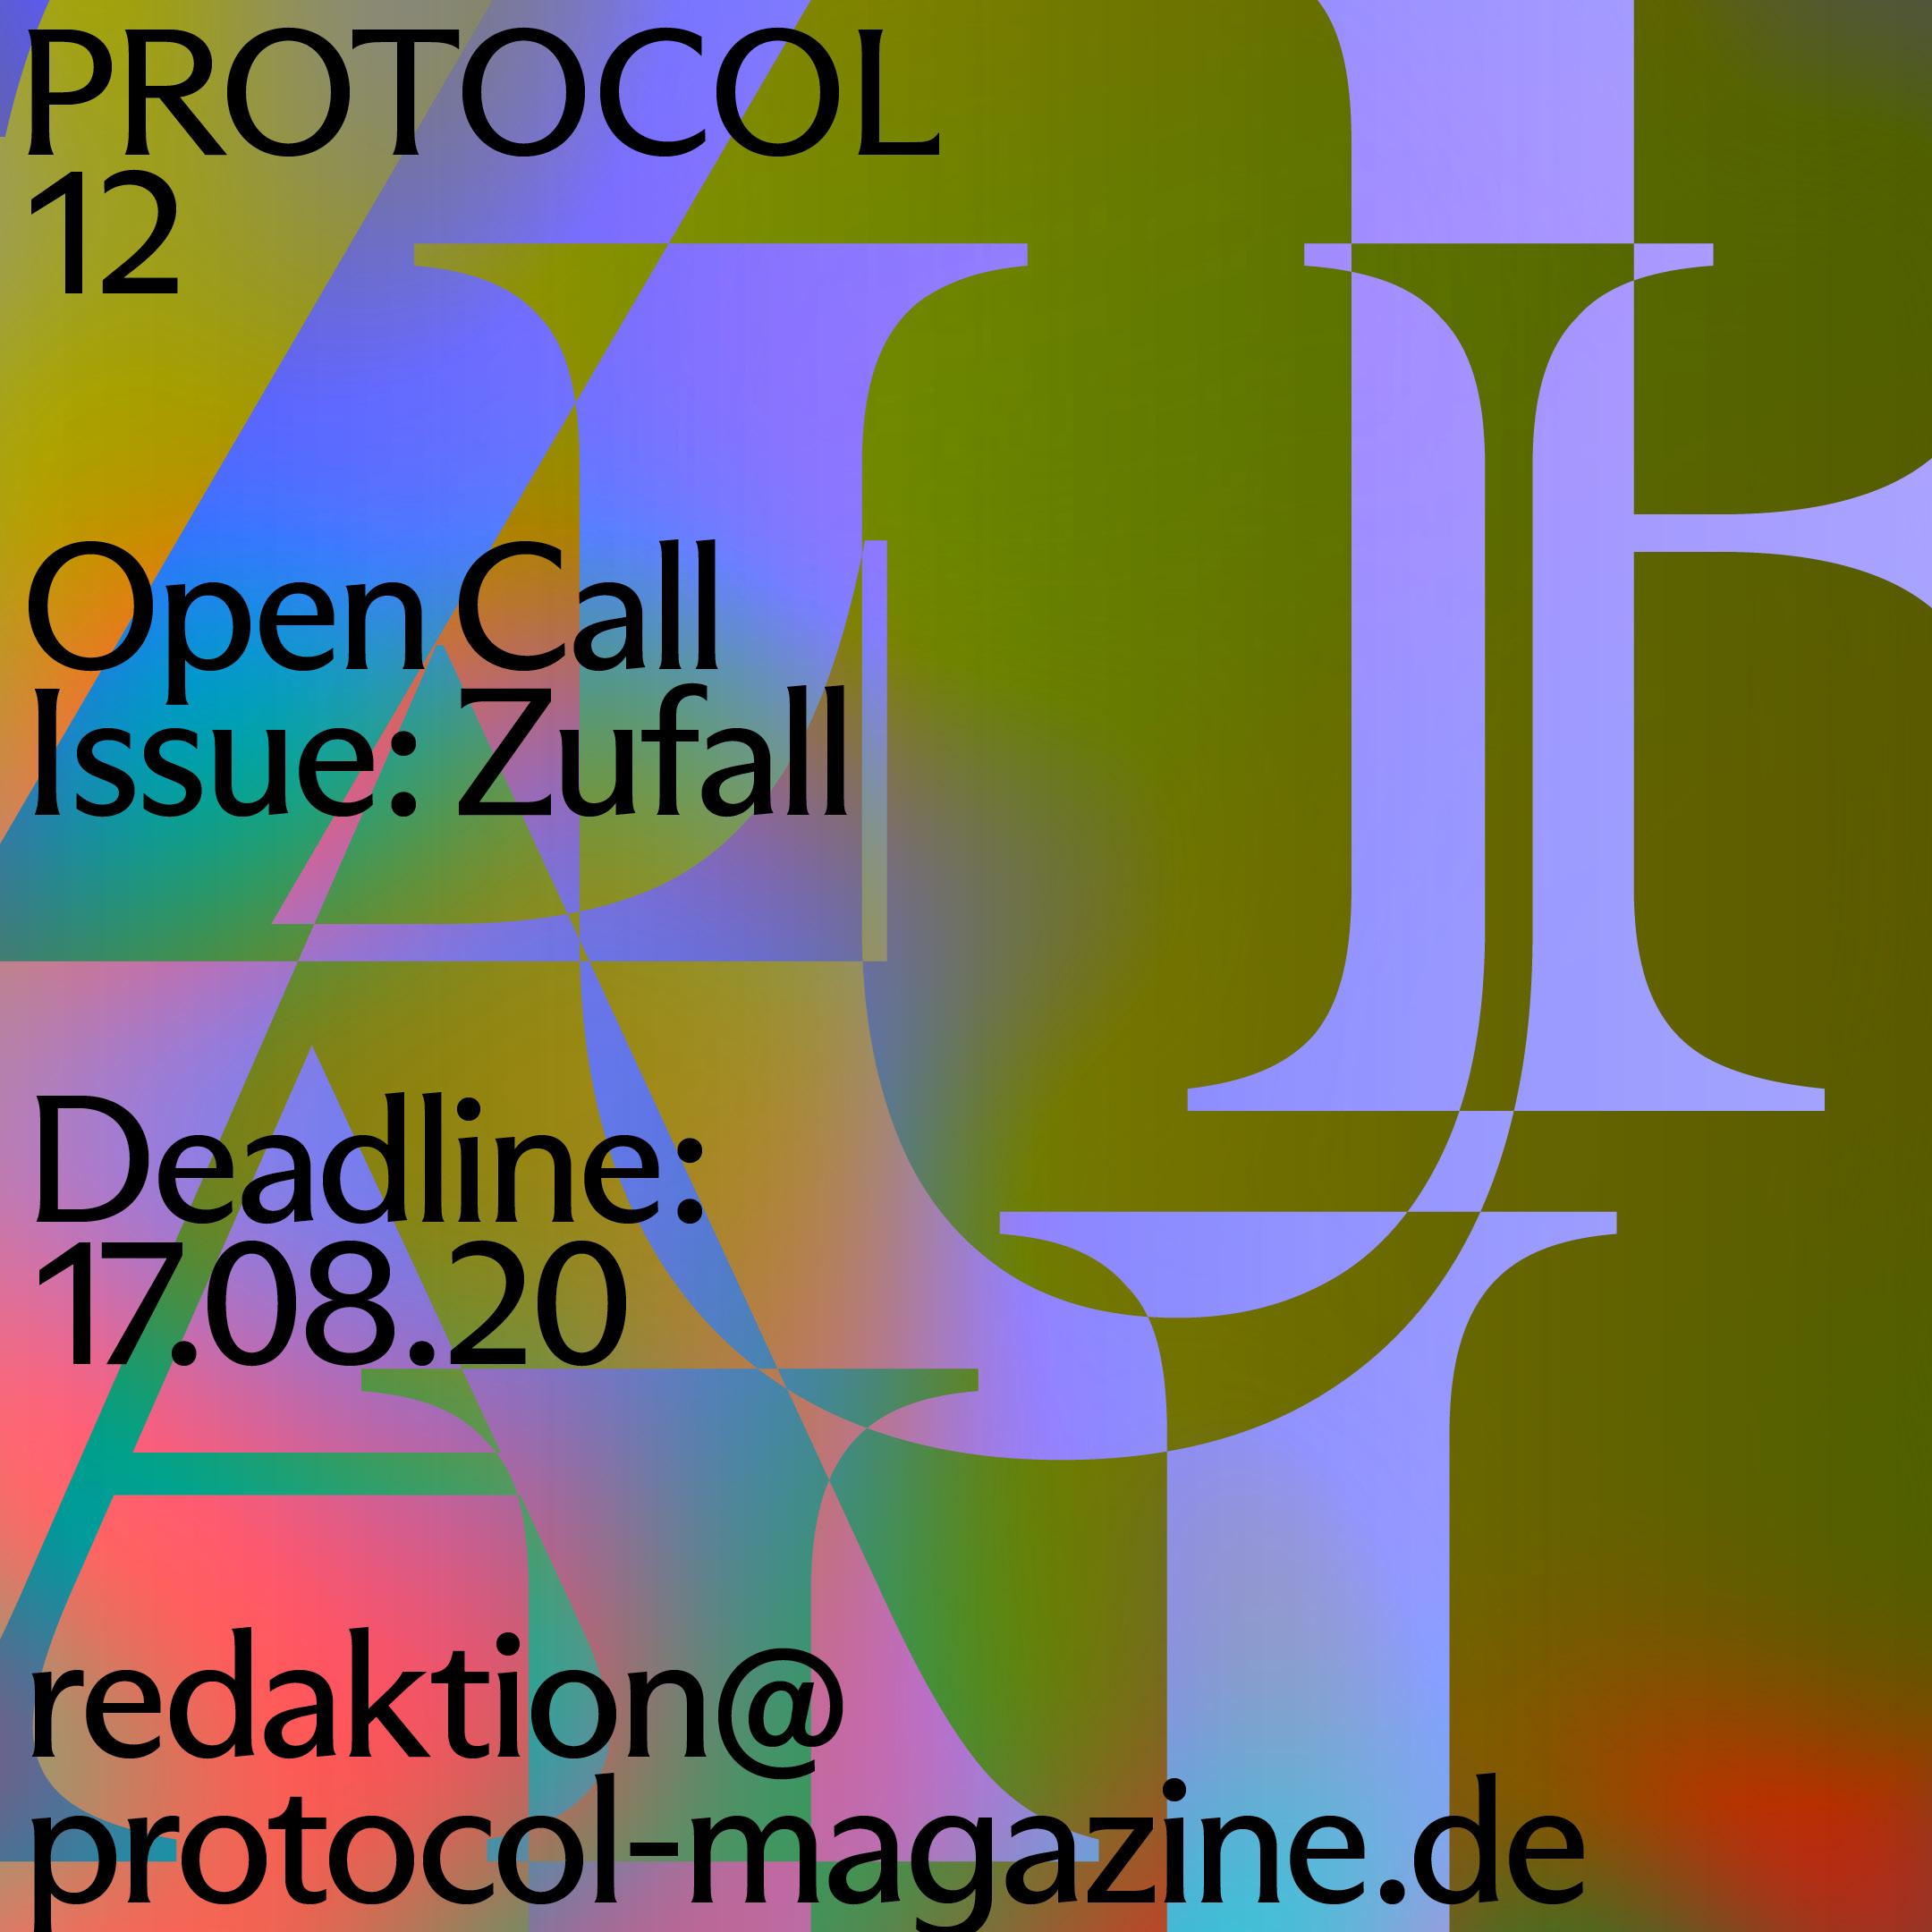 p12_Instagram-Redaktion_Protocol-Magazin_Magazin-fuer-Architektur-im-Kontext19